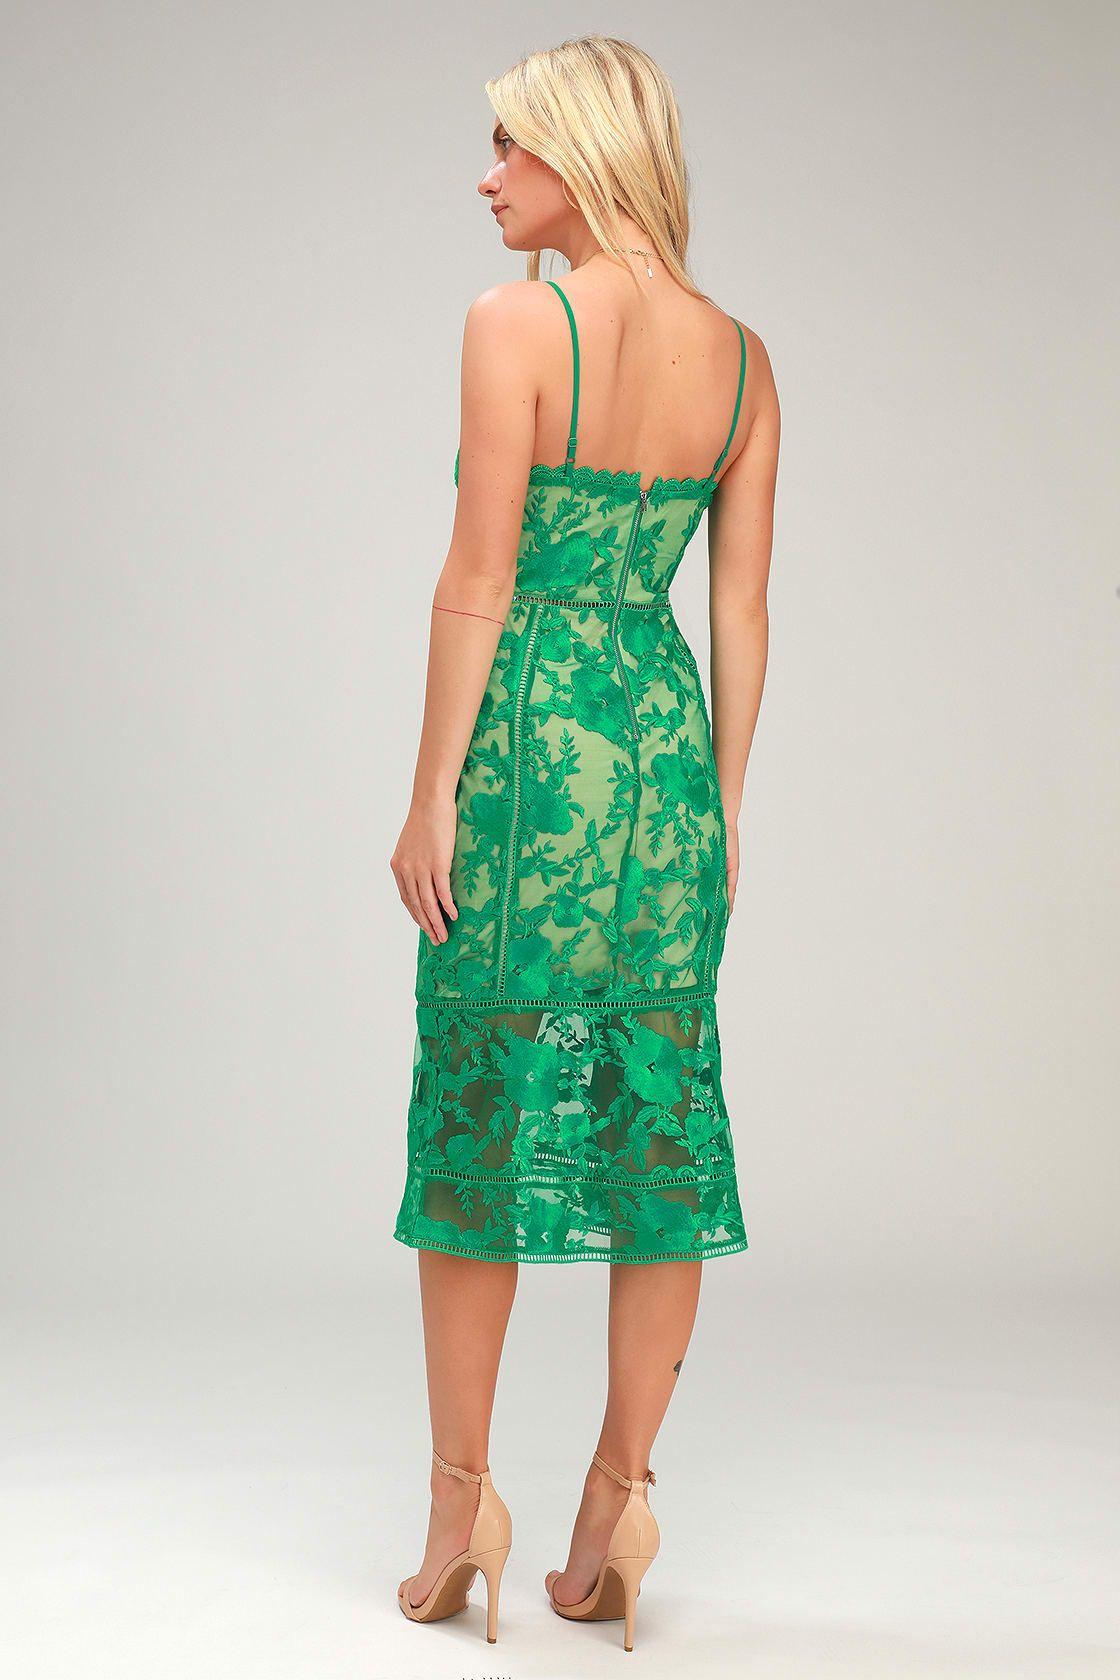 Deeply cherished green lace midi dress green lace midi